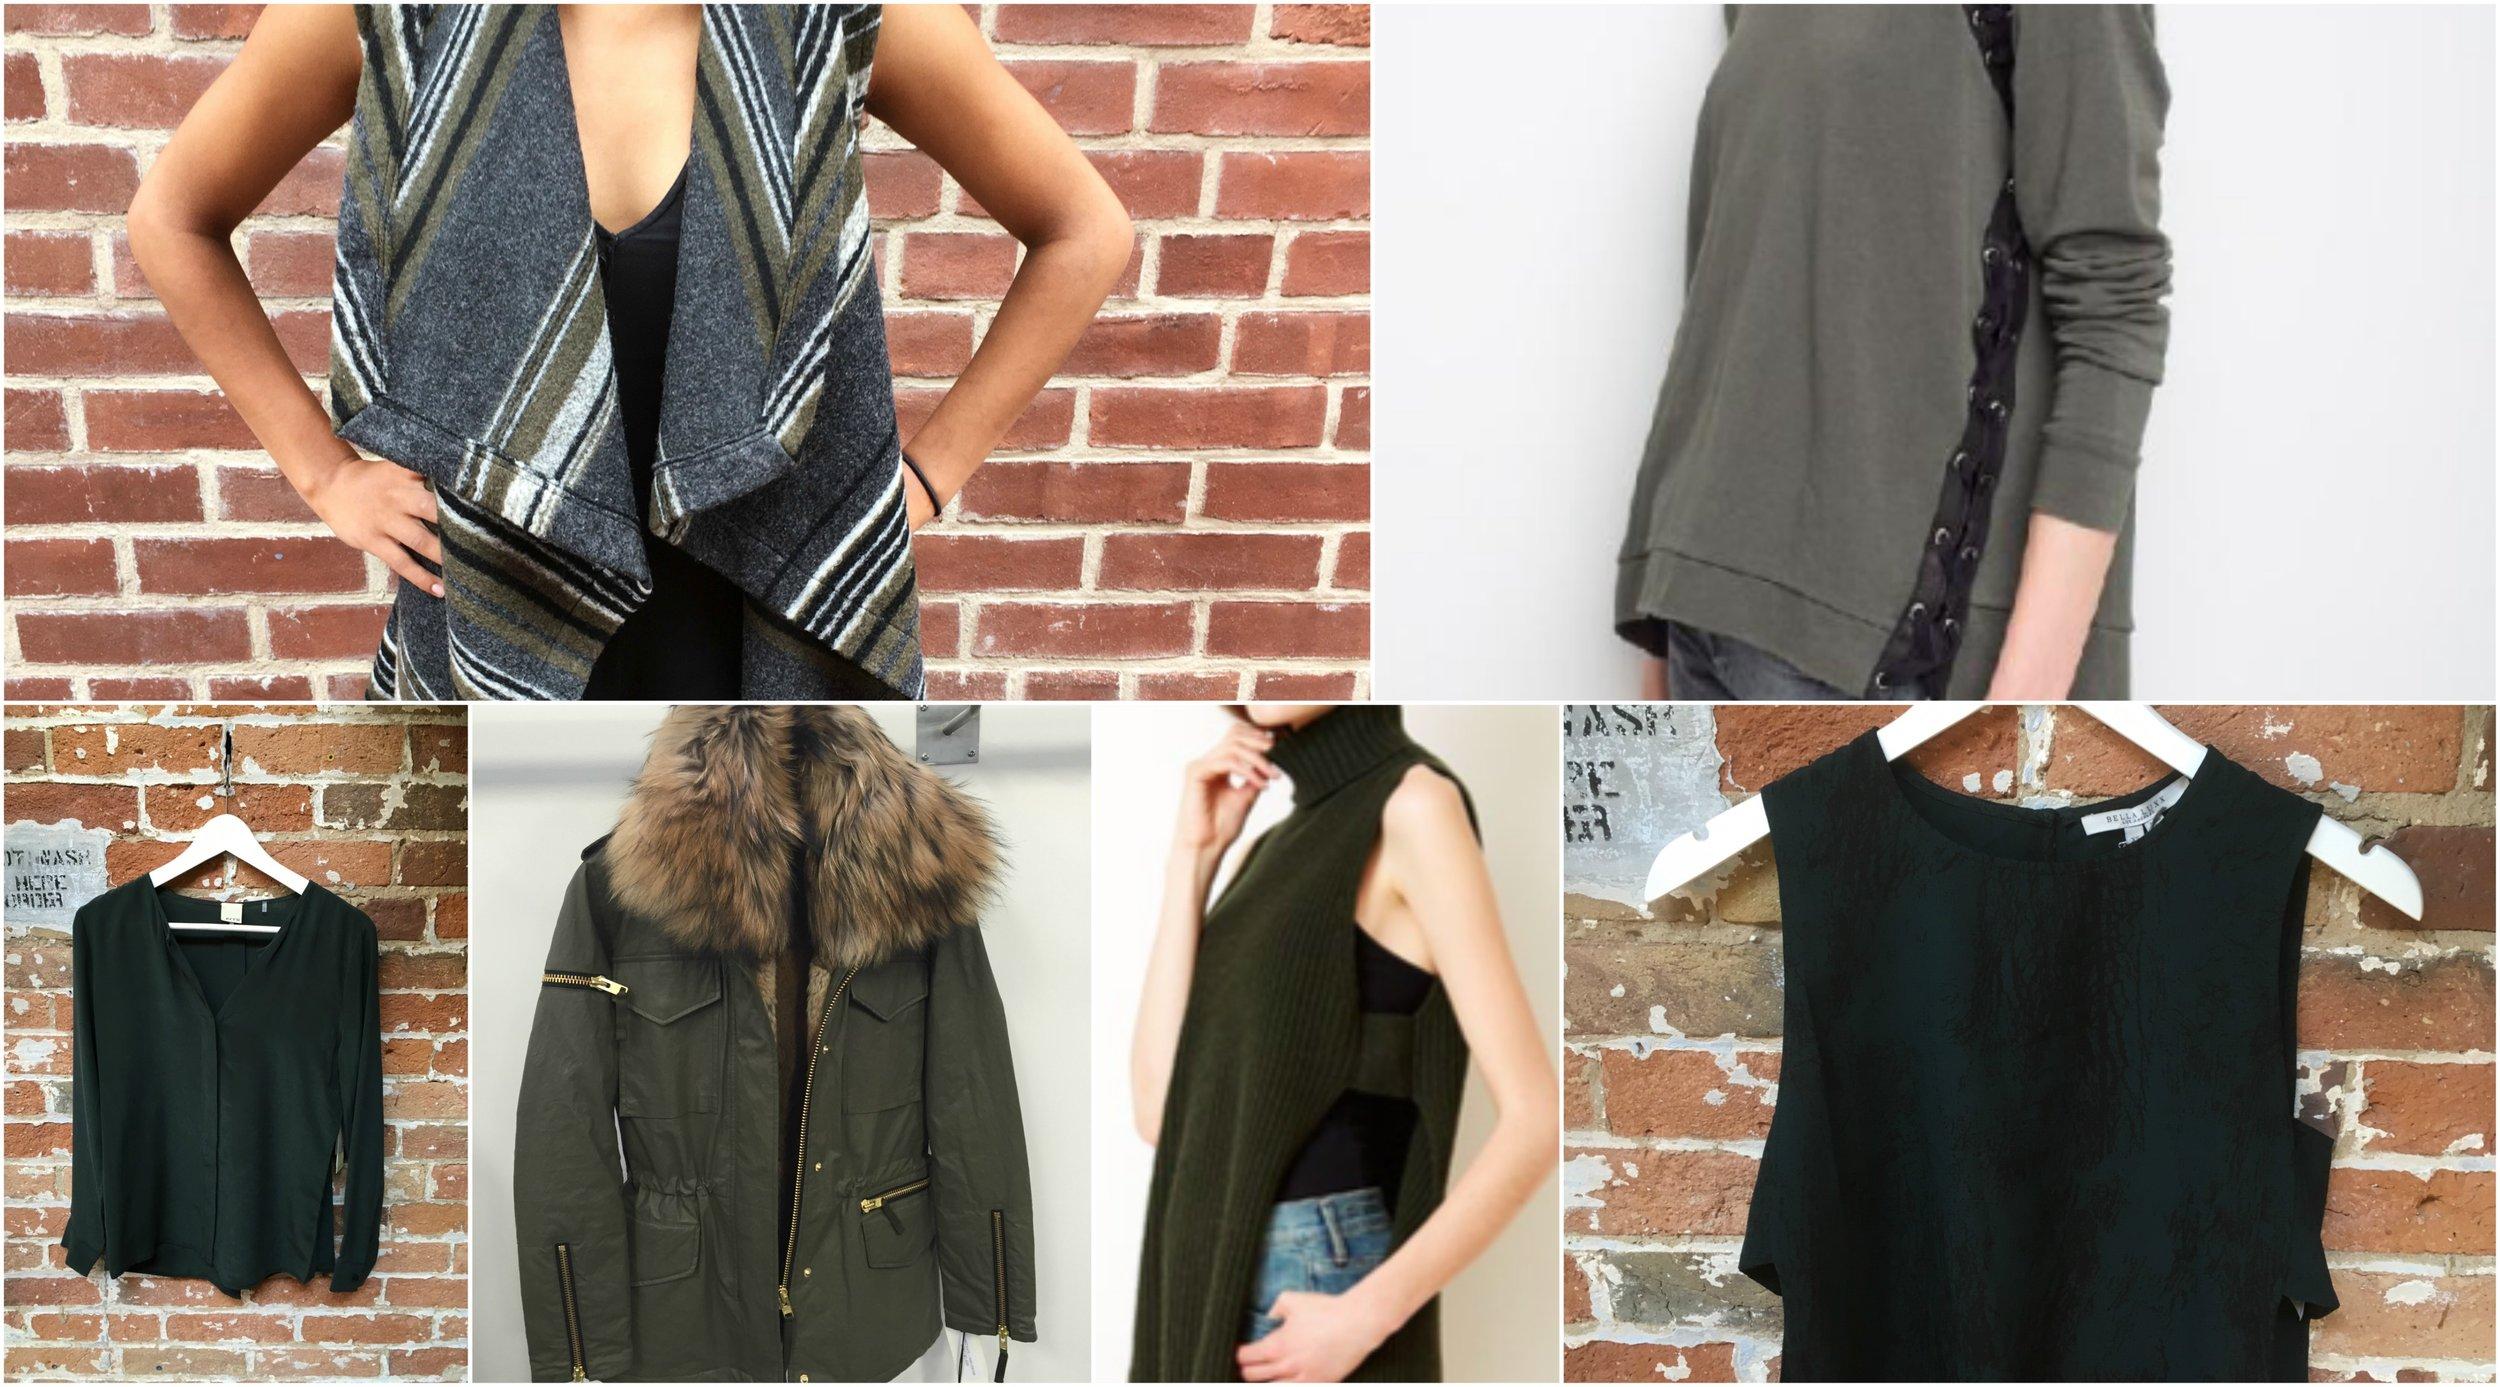 Ecru silk blouse, Cupcakes & Cashmere open vest, S.A.M anorak jacket (coming soon), Autumn Cashmere sleeveless turtleneck, Generation Love lace up sweatshirt, Bella Luxx tank top